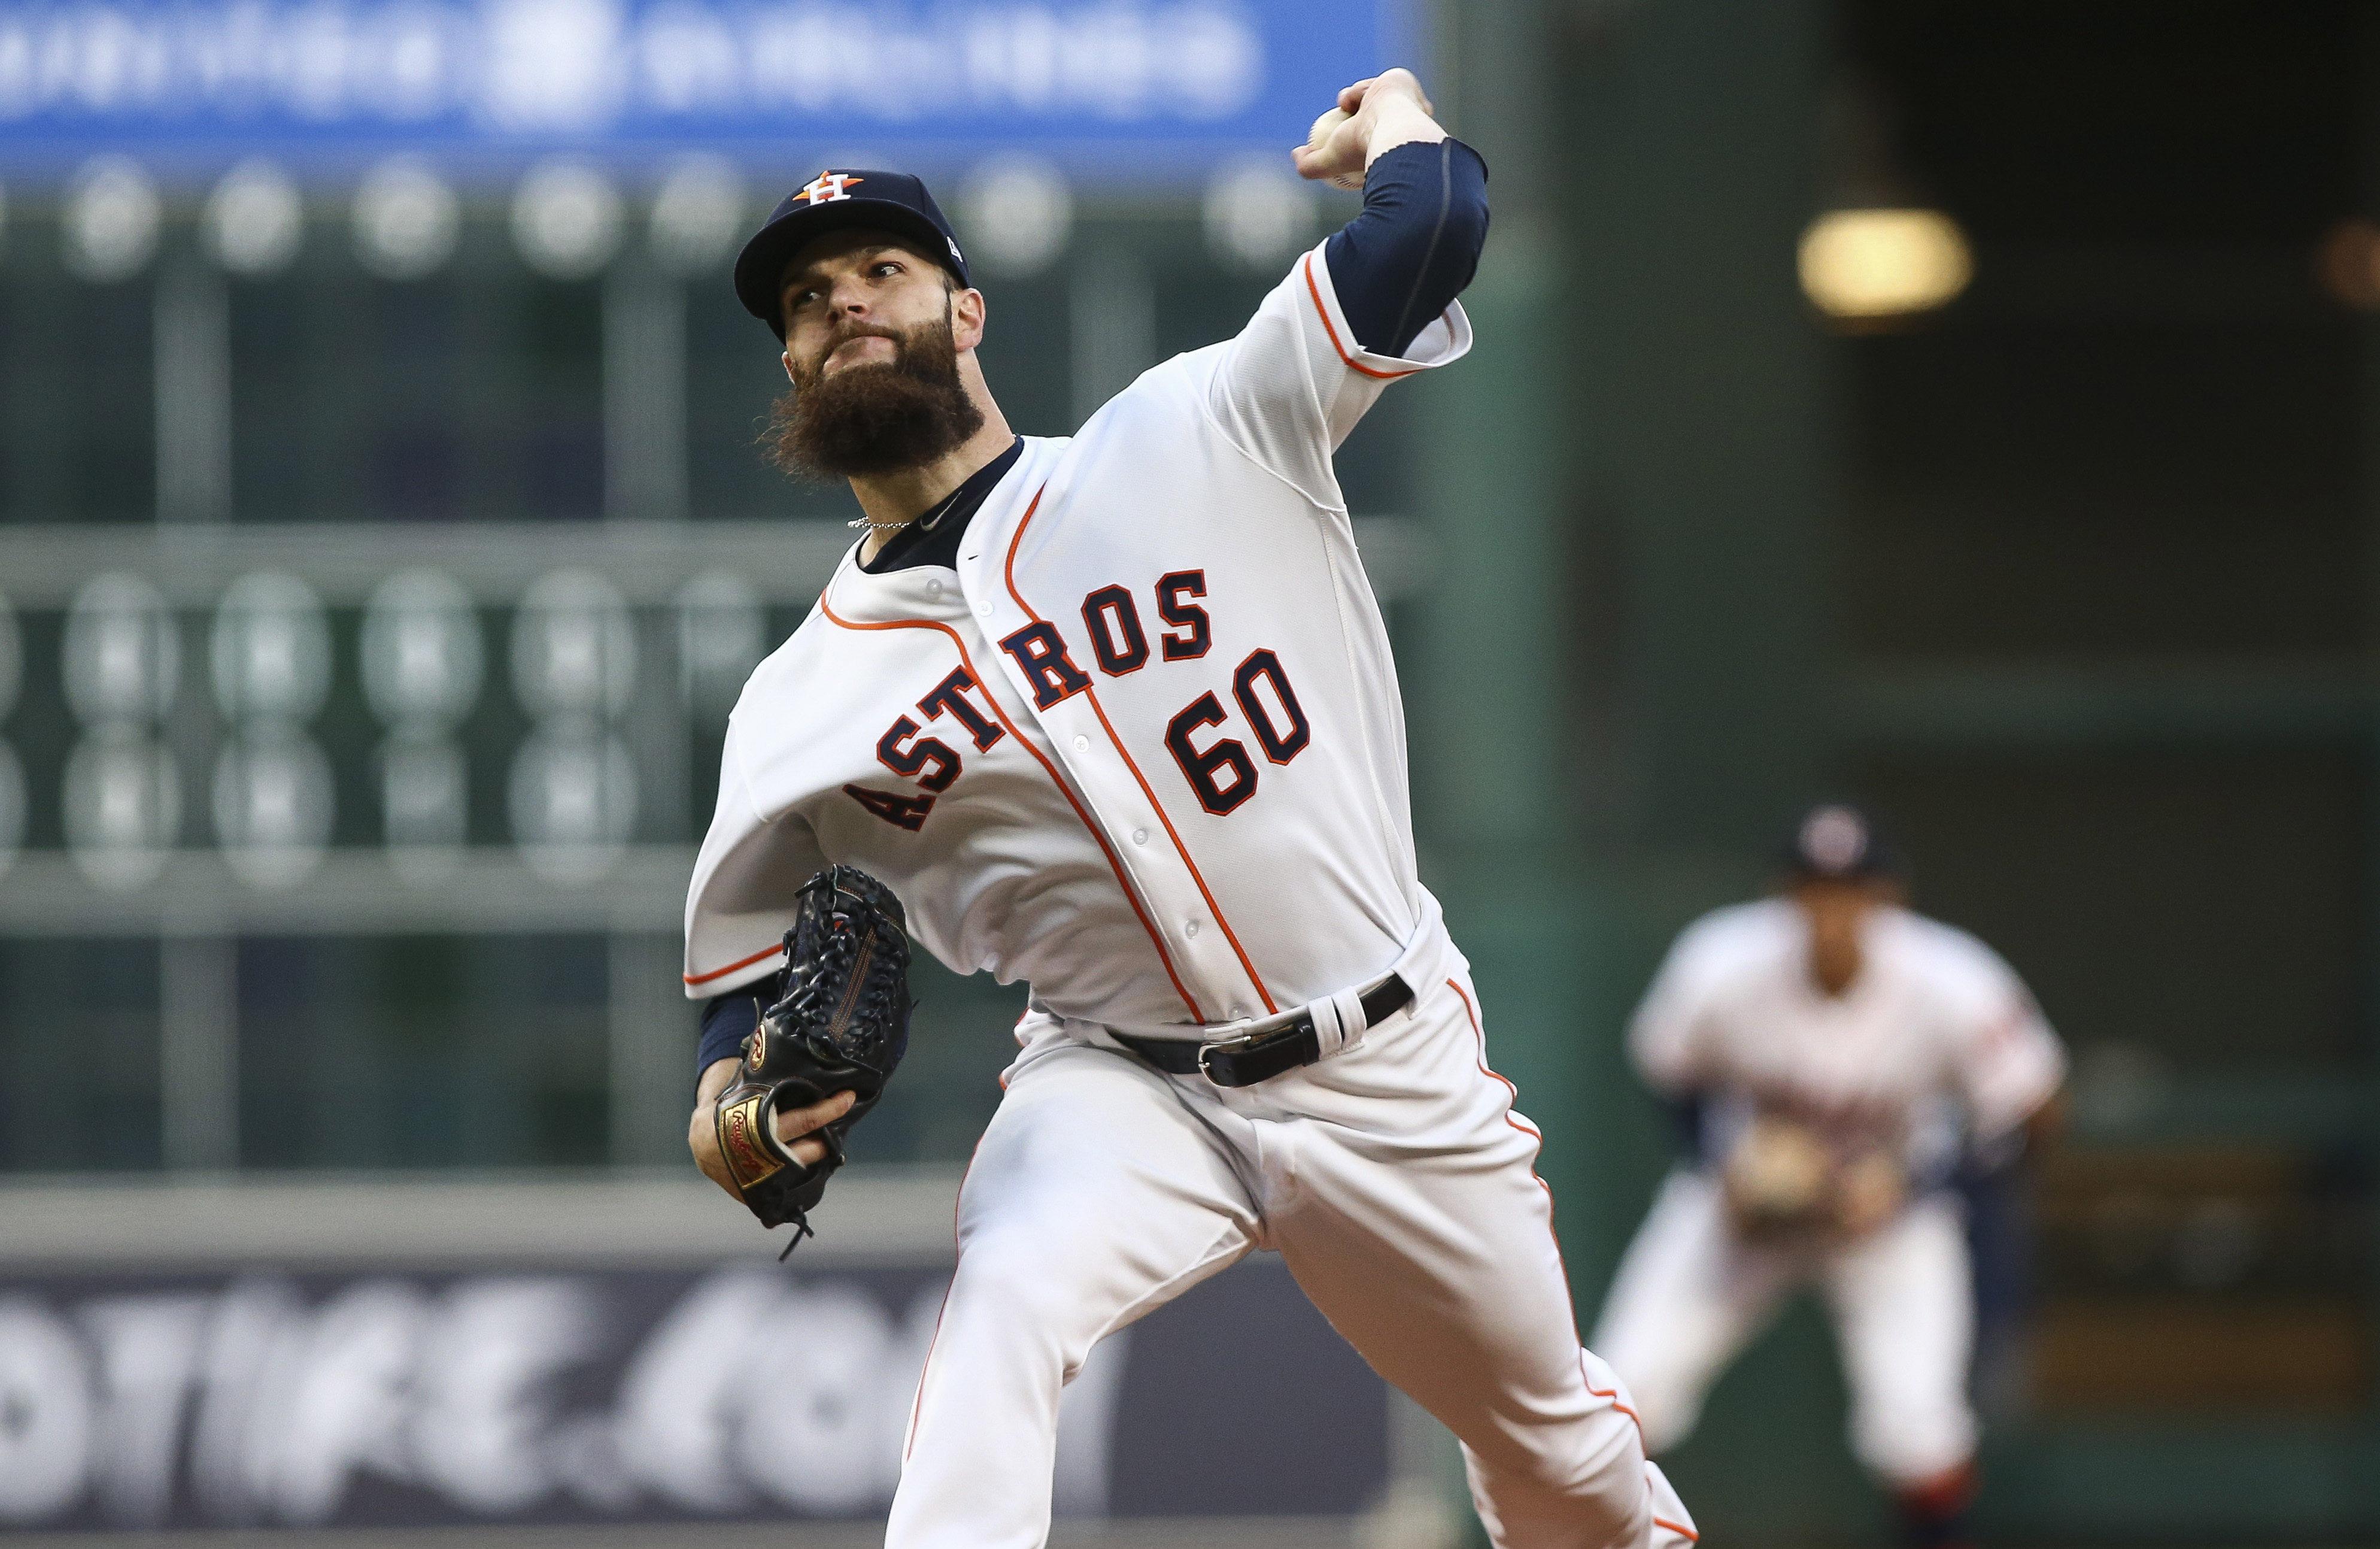 DraftKings Late MLB Picks For April 30